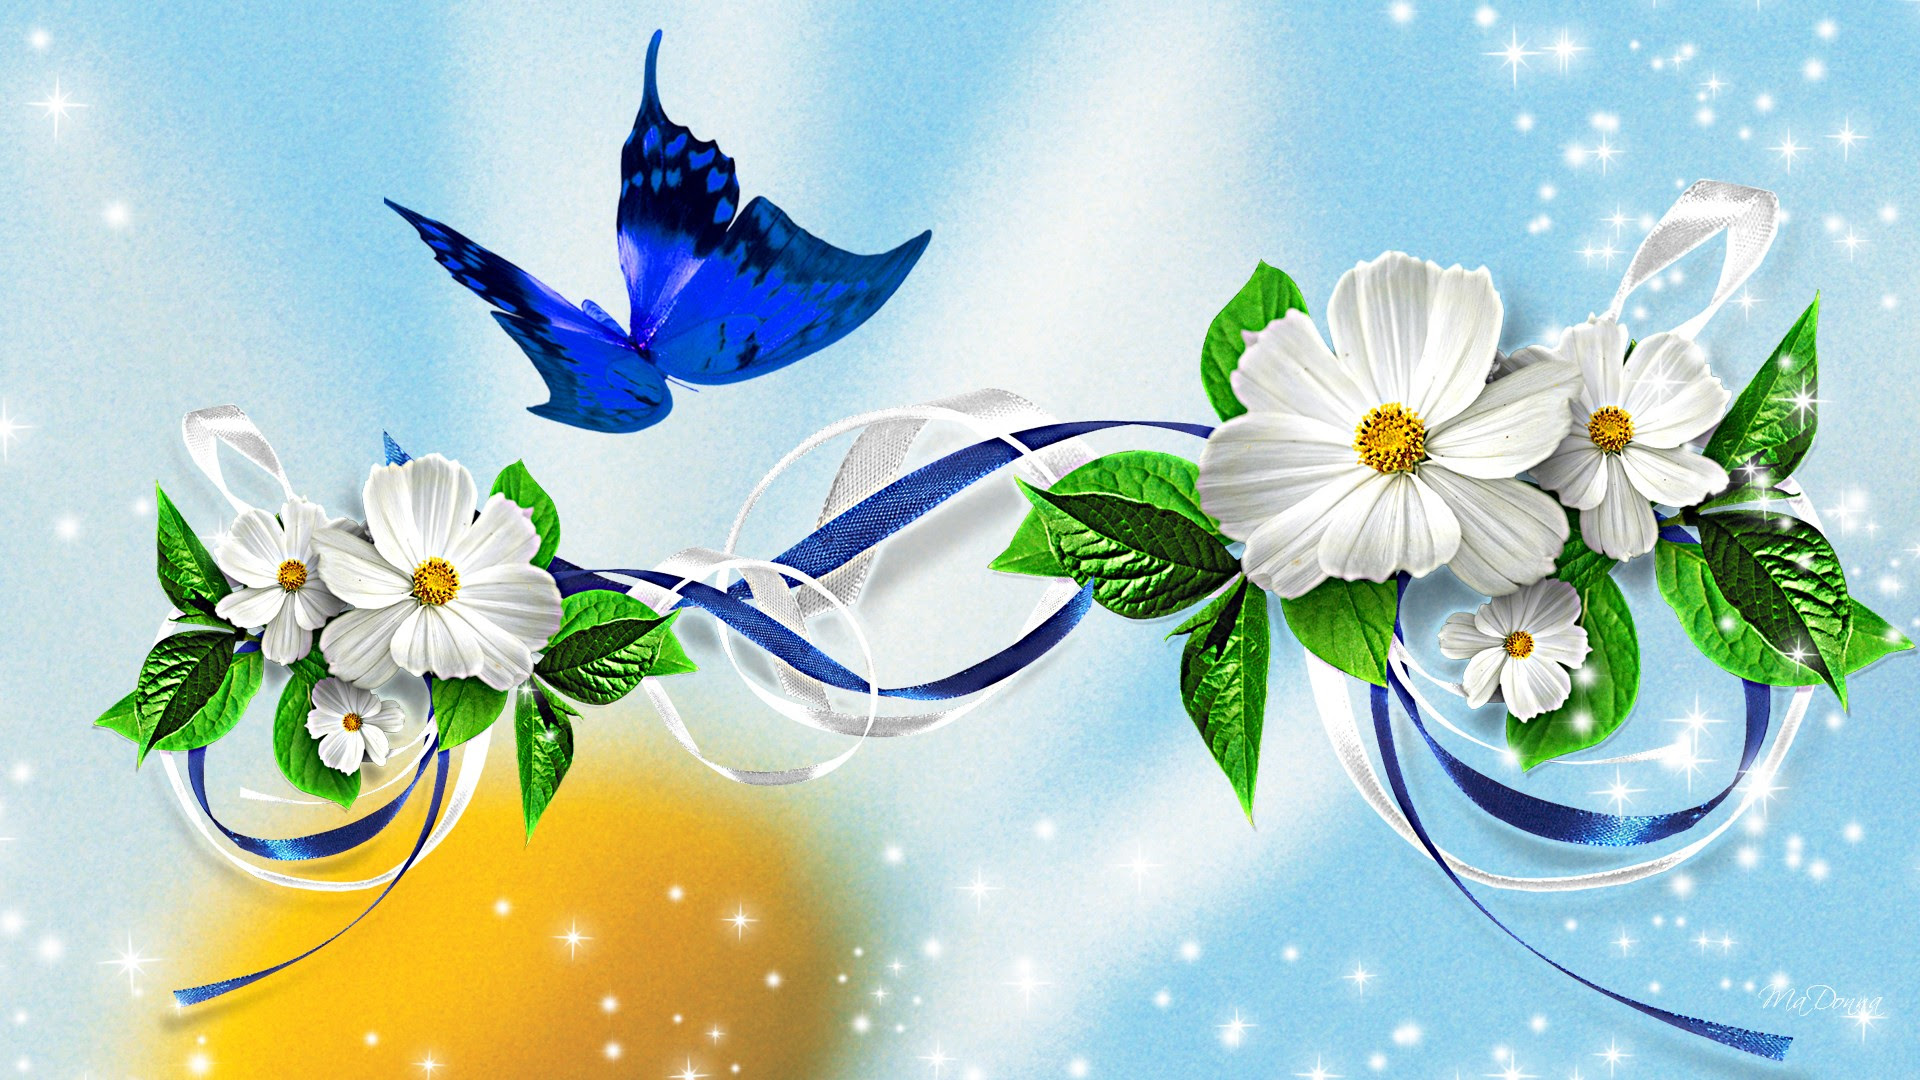 Butterfly Flower Wallpaper | Top Wallpapers